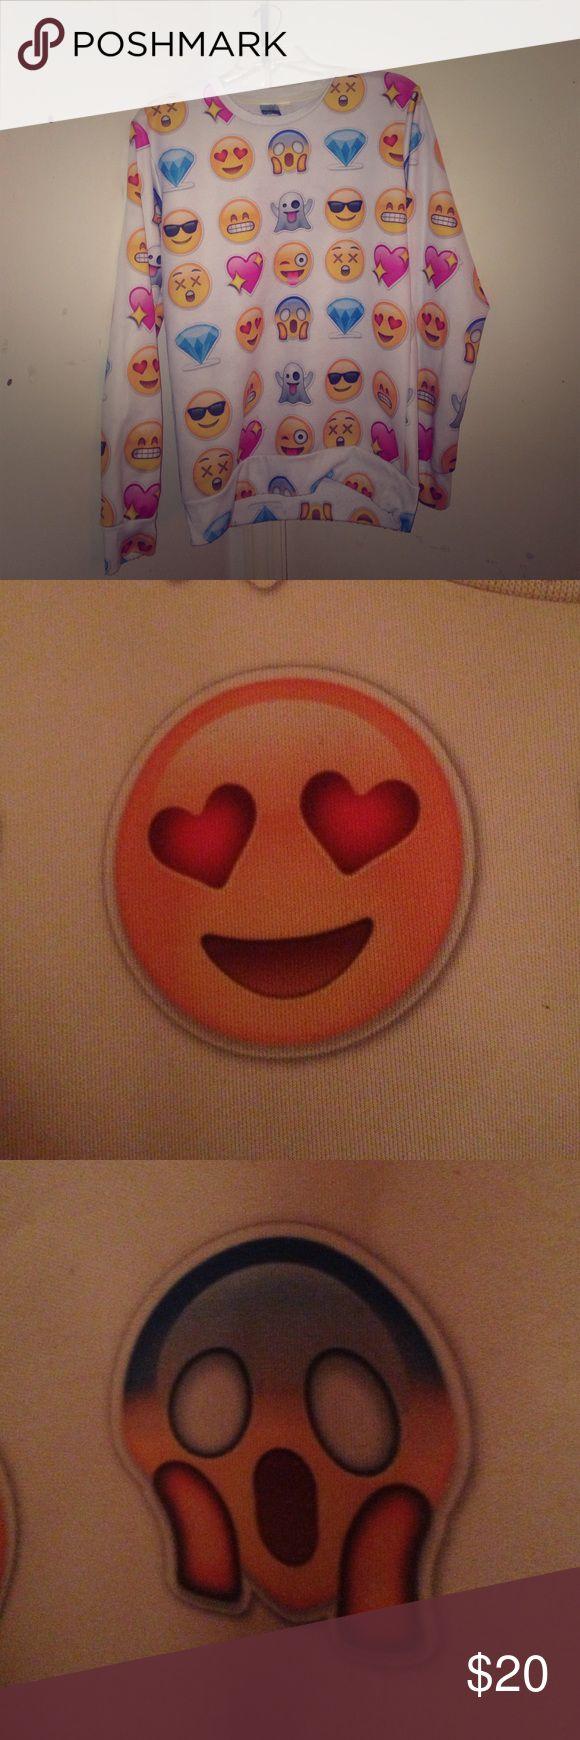 Emoji sweatshirt Diamond emoji , heart eyes emoji, dead emoji , ghost emoji , shocked emoji , Smiling emoji heart emoji Gugu Tops Sweatshirts & Hoodies